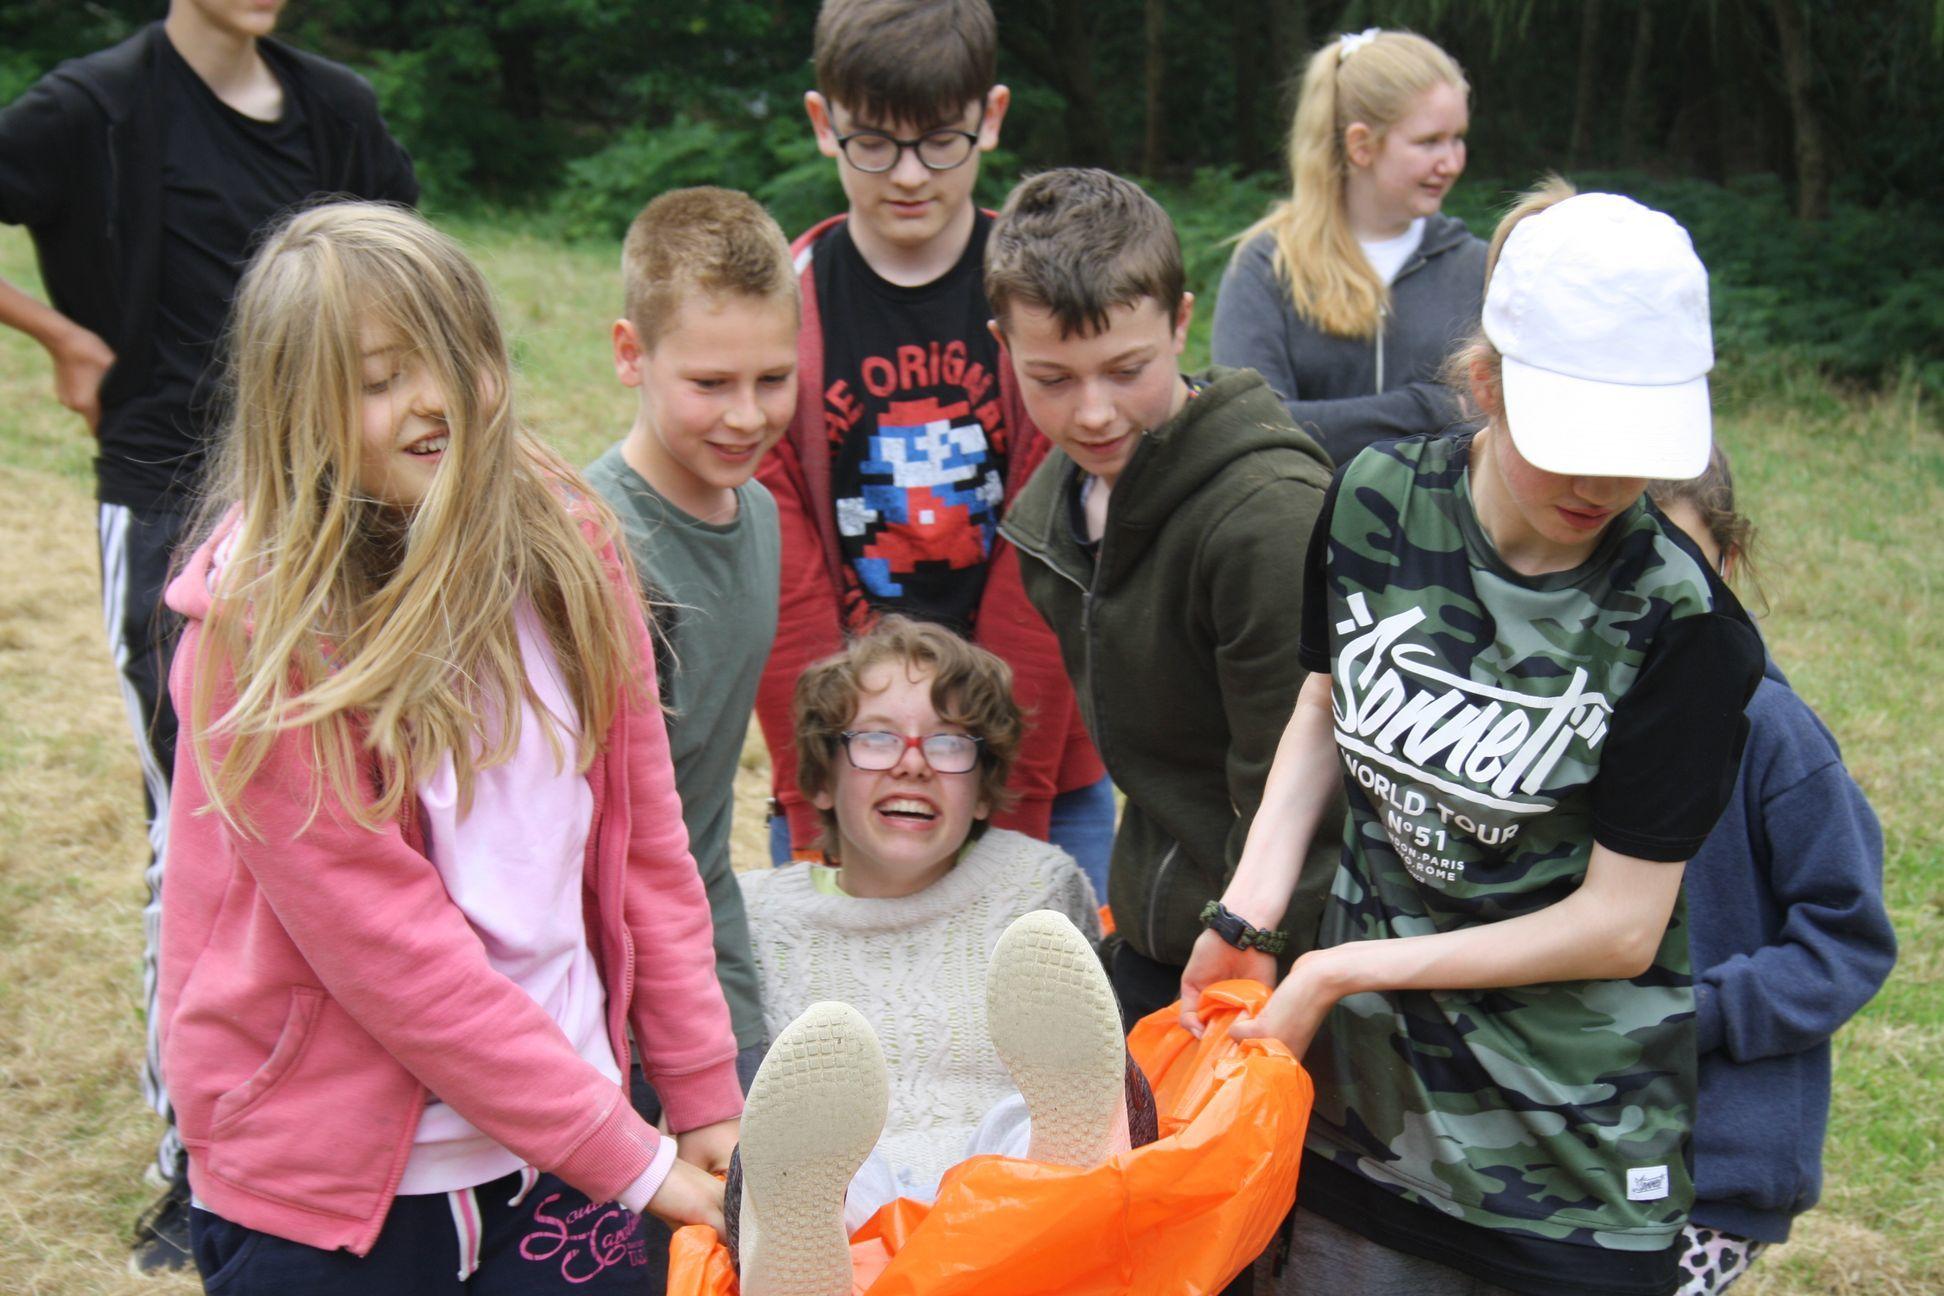 Pupils at LVS Oxford try bushcraft at Blenheim